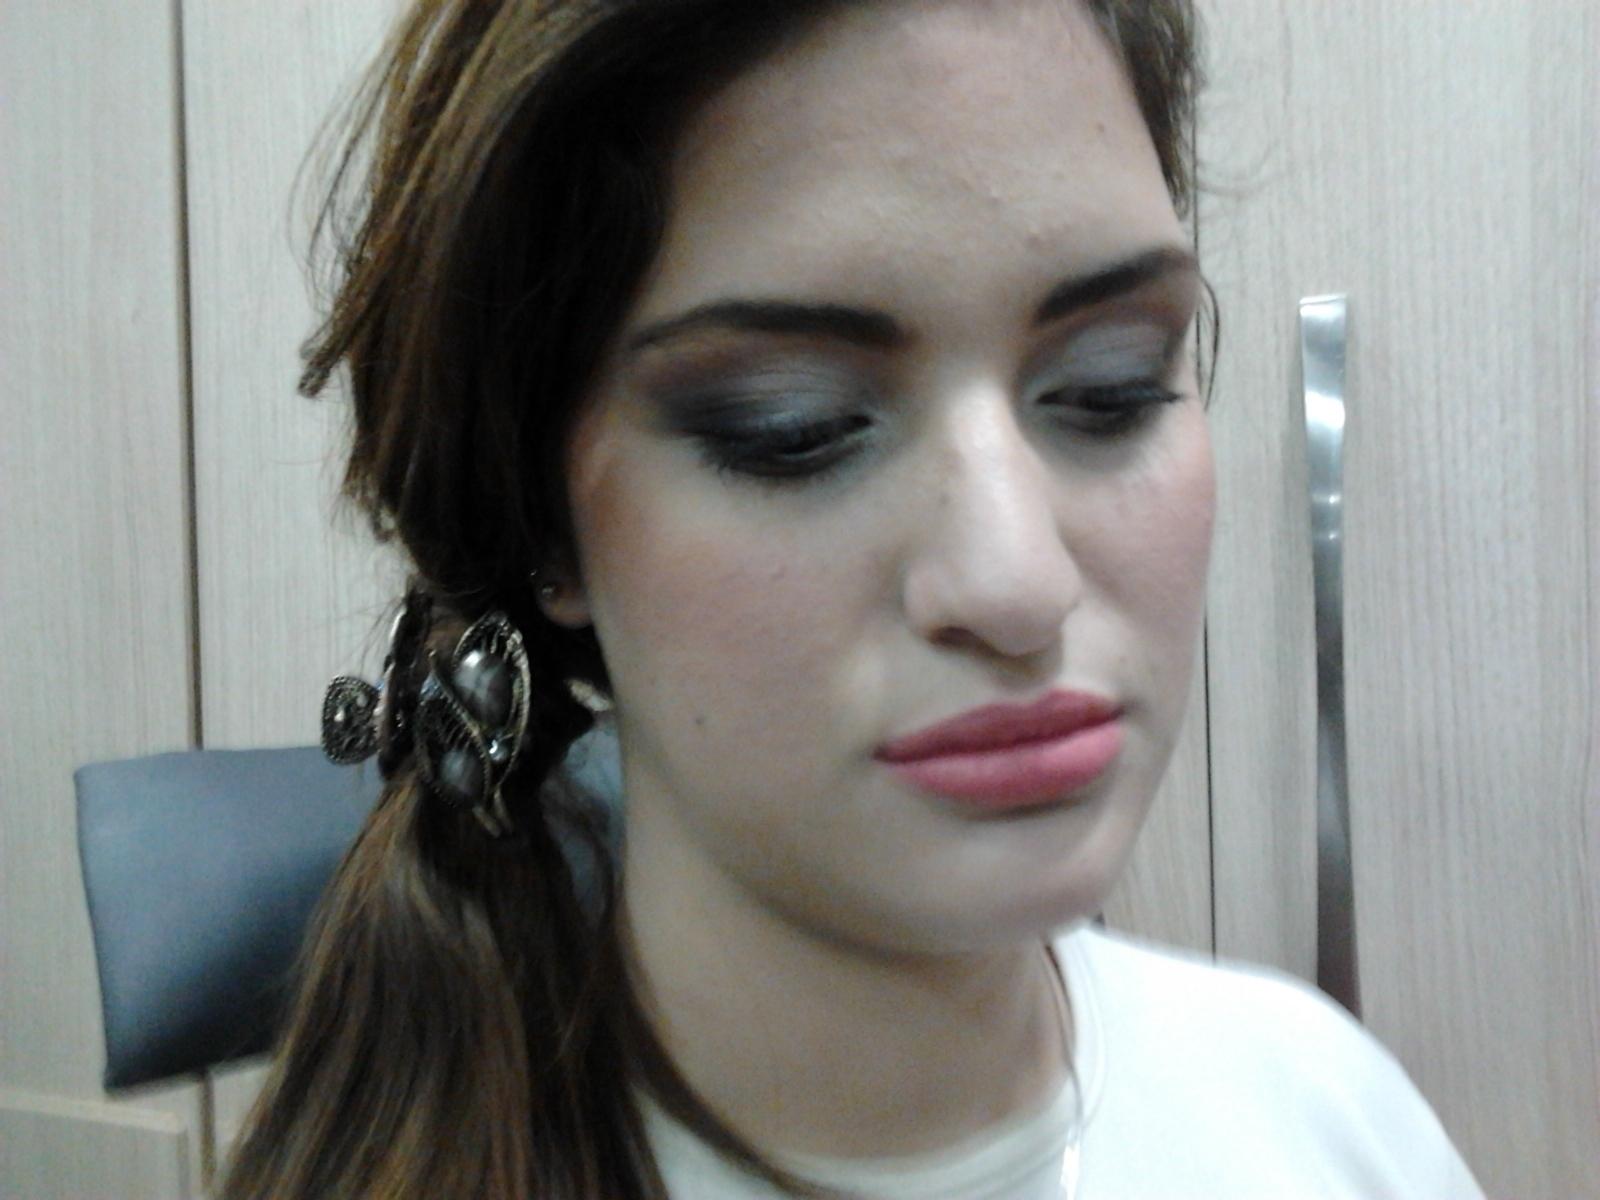 Maquiagem09 maquiador(a) consultor(a) de estetica